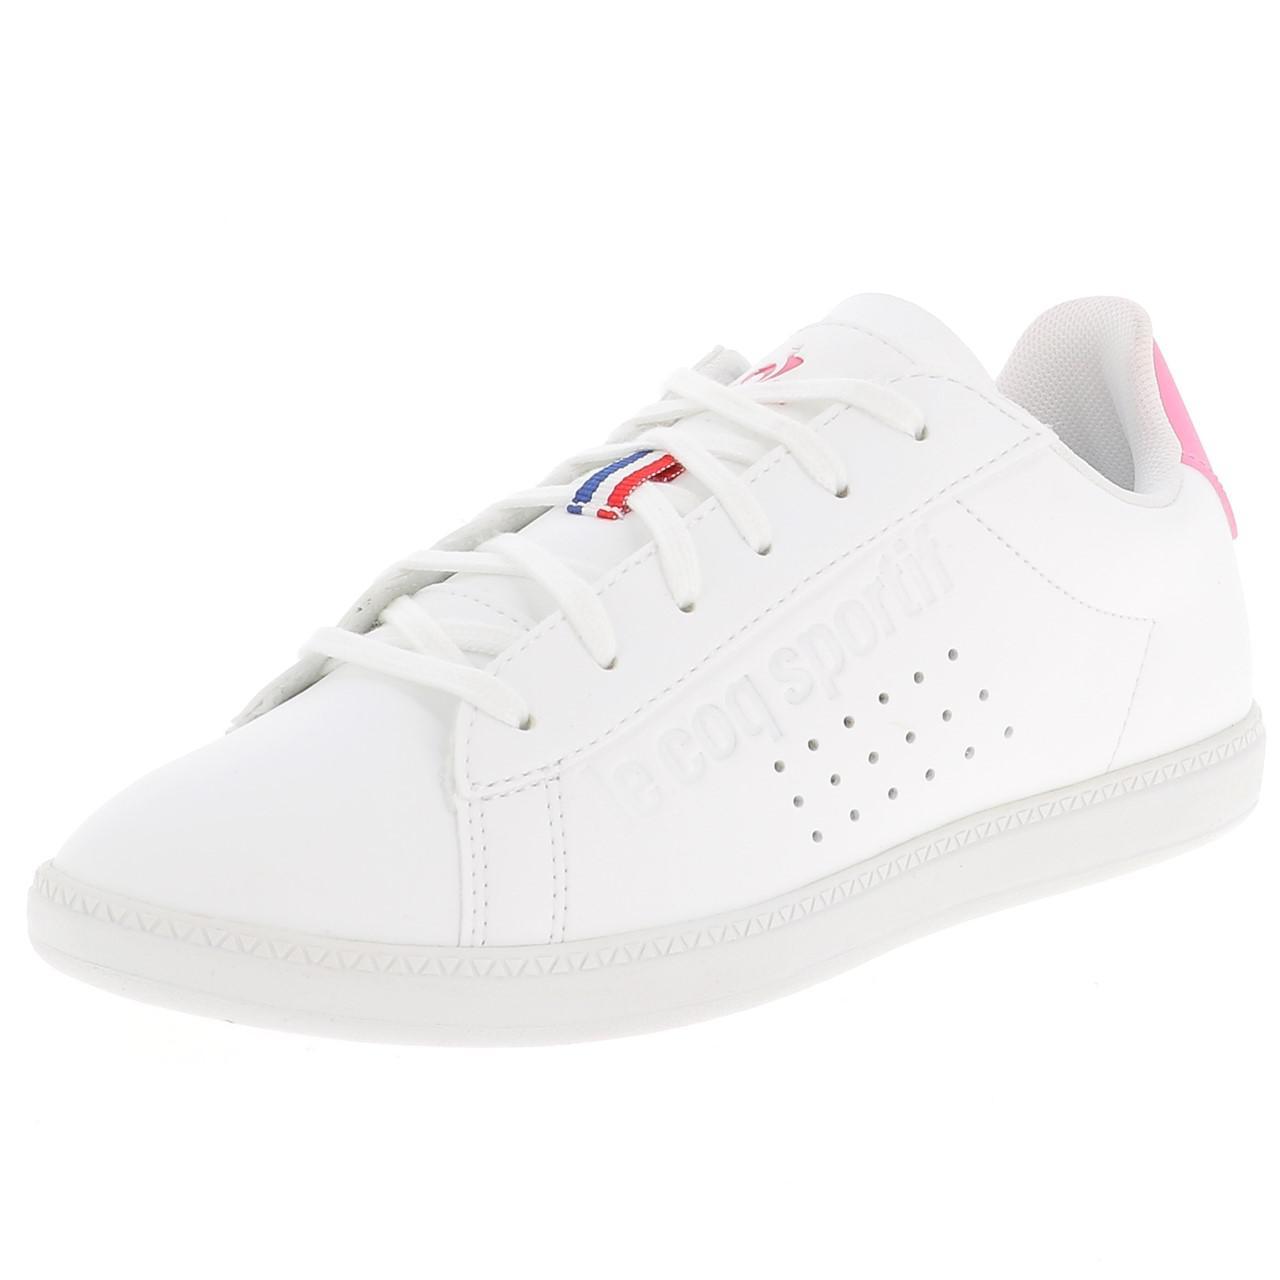 Schuhe-Niedrig-Leder-oder-Faux-Le-Coq-Sportif-Courtset-Maedchen-Blc-Weiss-47681